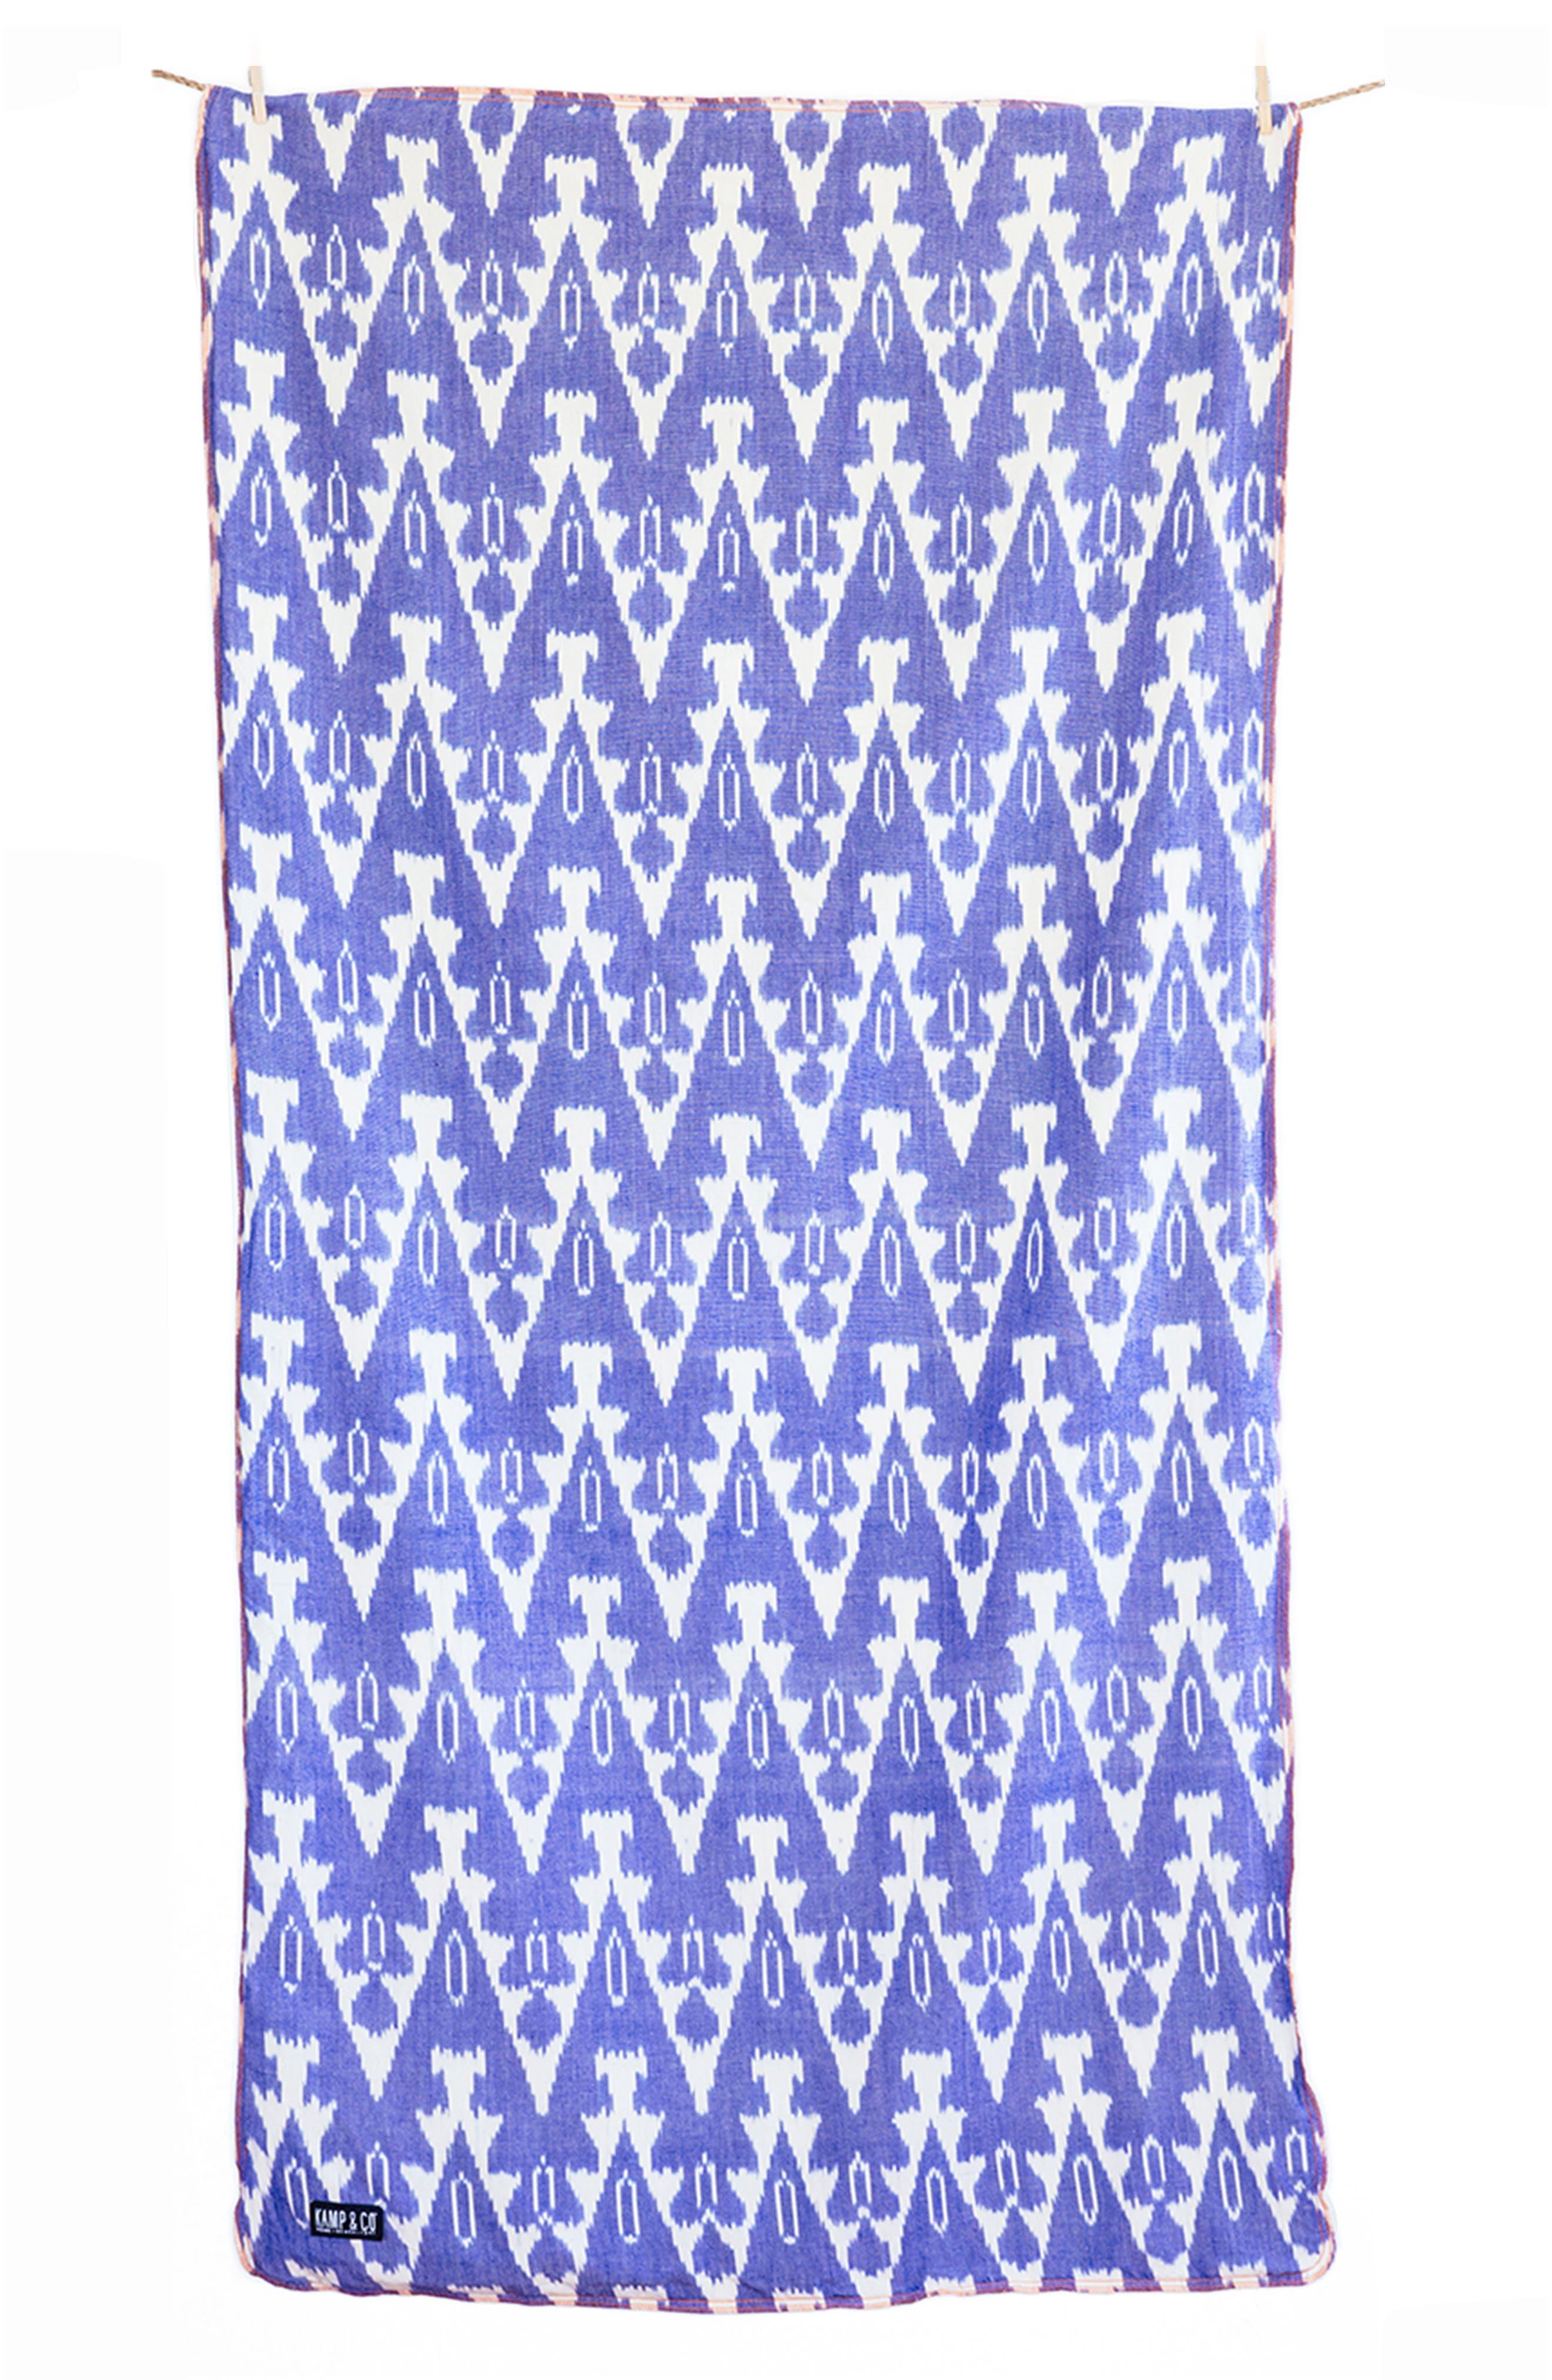 Kamp & Co. Torrey Kamp Towel,                             Main thumbnail 1, color,